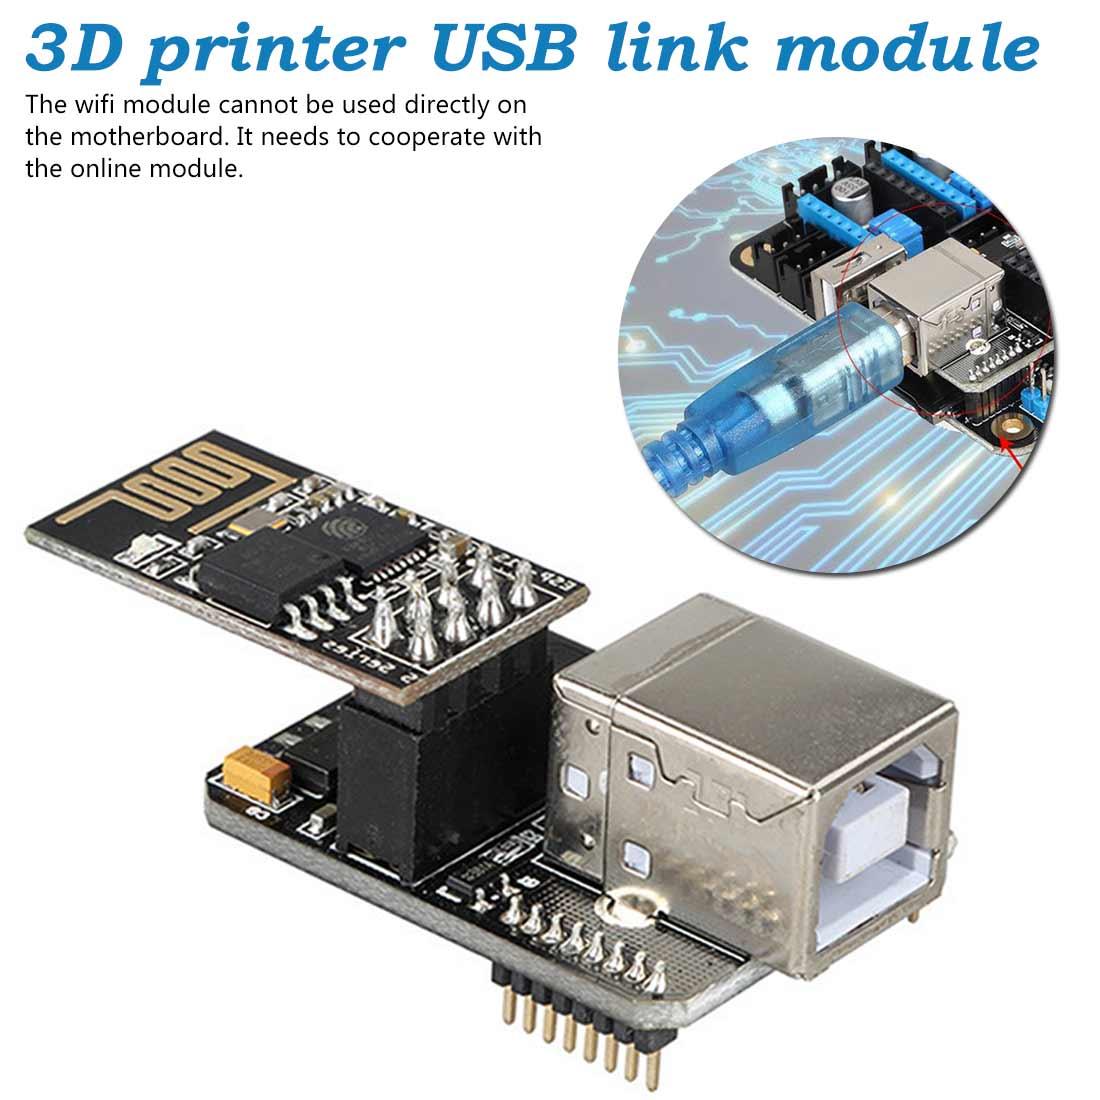 Extensible Parts Lerdge K 3D Printer Motherboard USB Link Module Computer Online Module WIFI Control Function